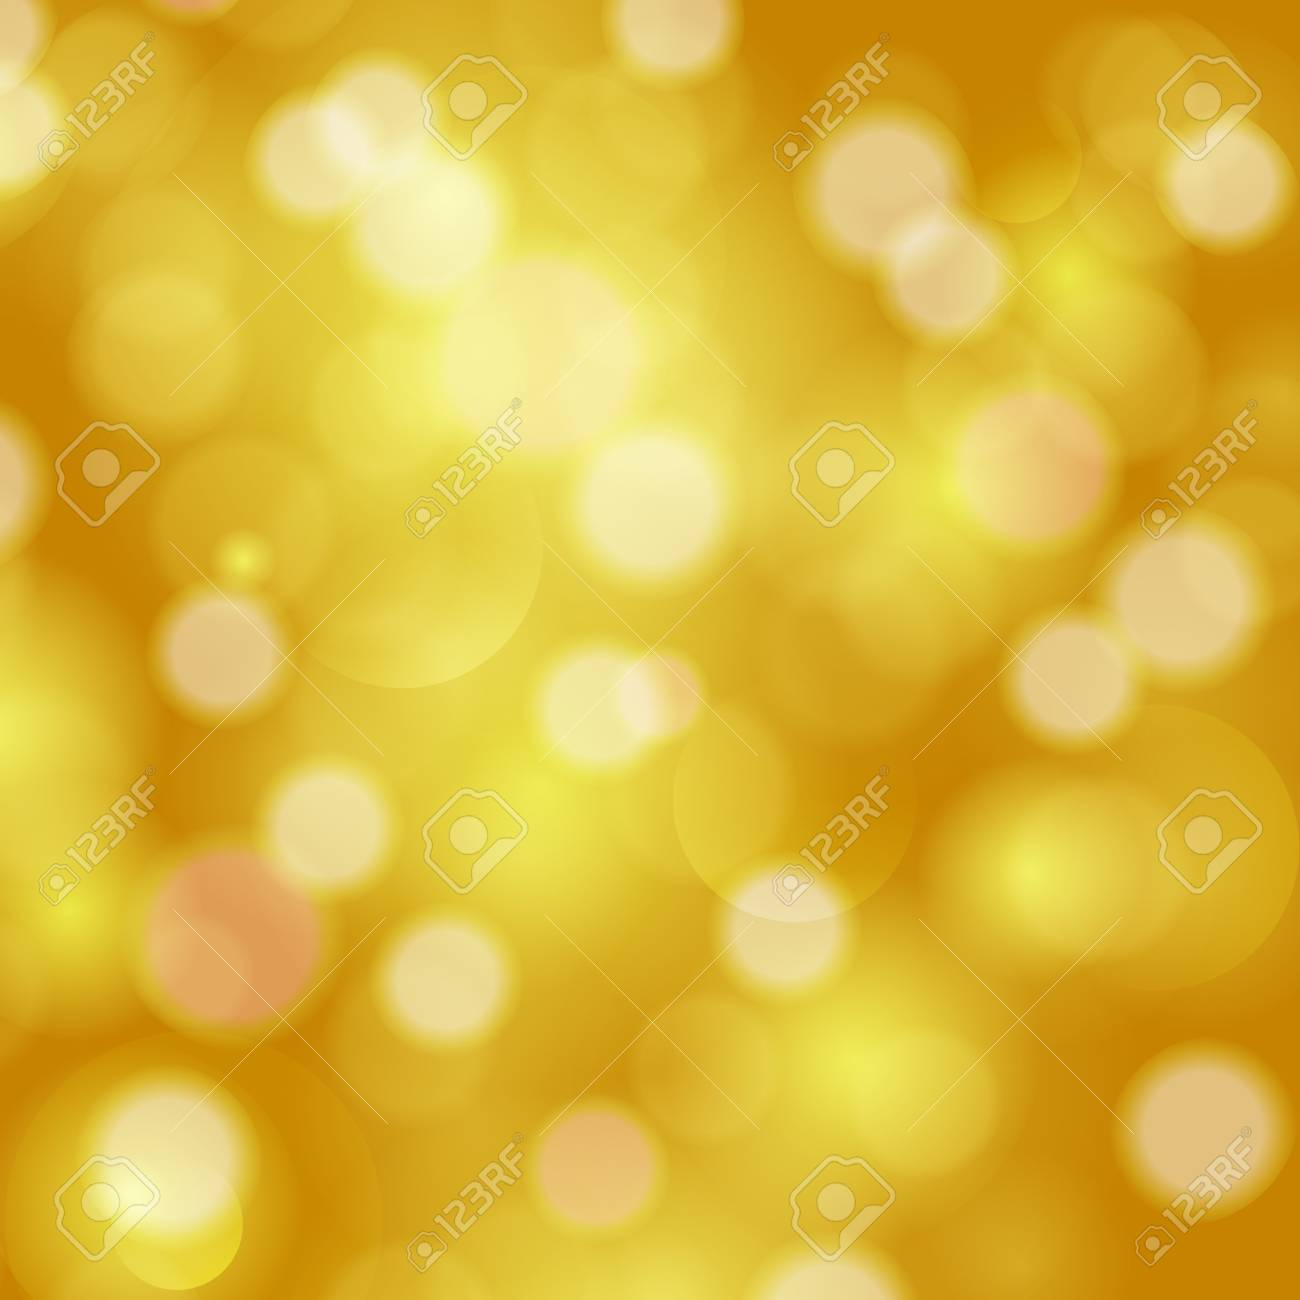 Glittery lights golden abstract festive background Stock Vector - 20753236